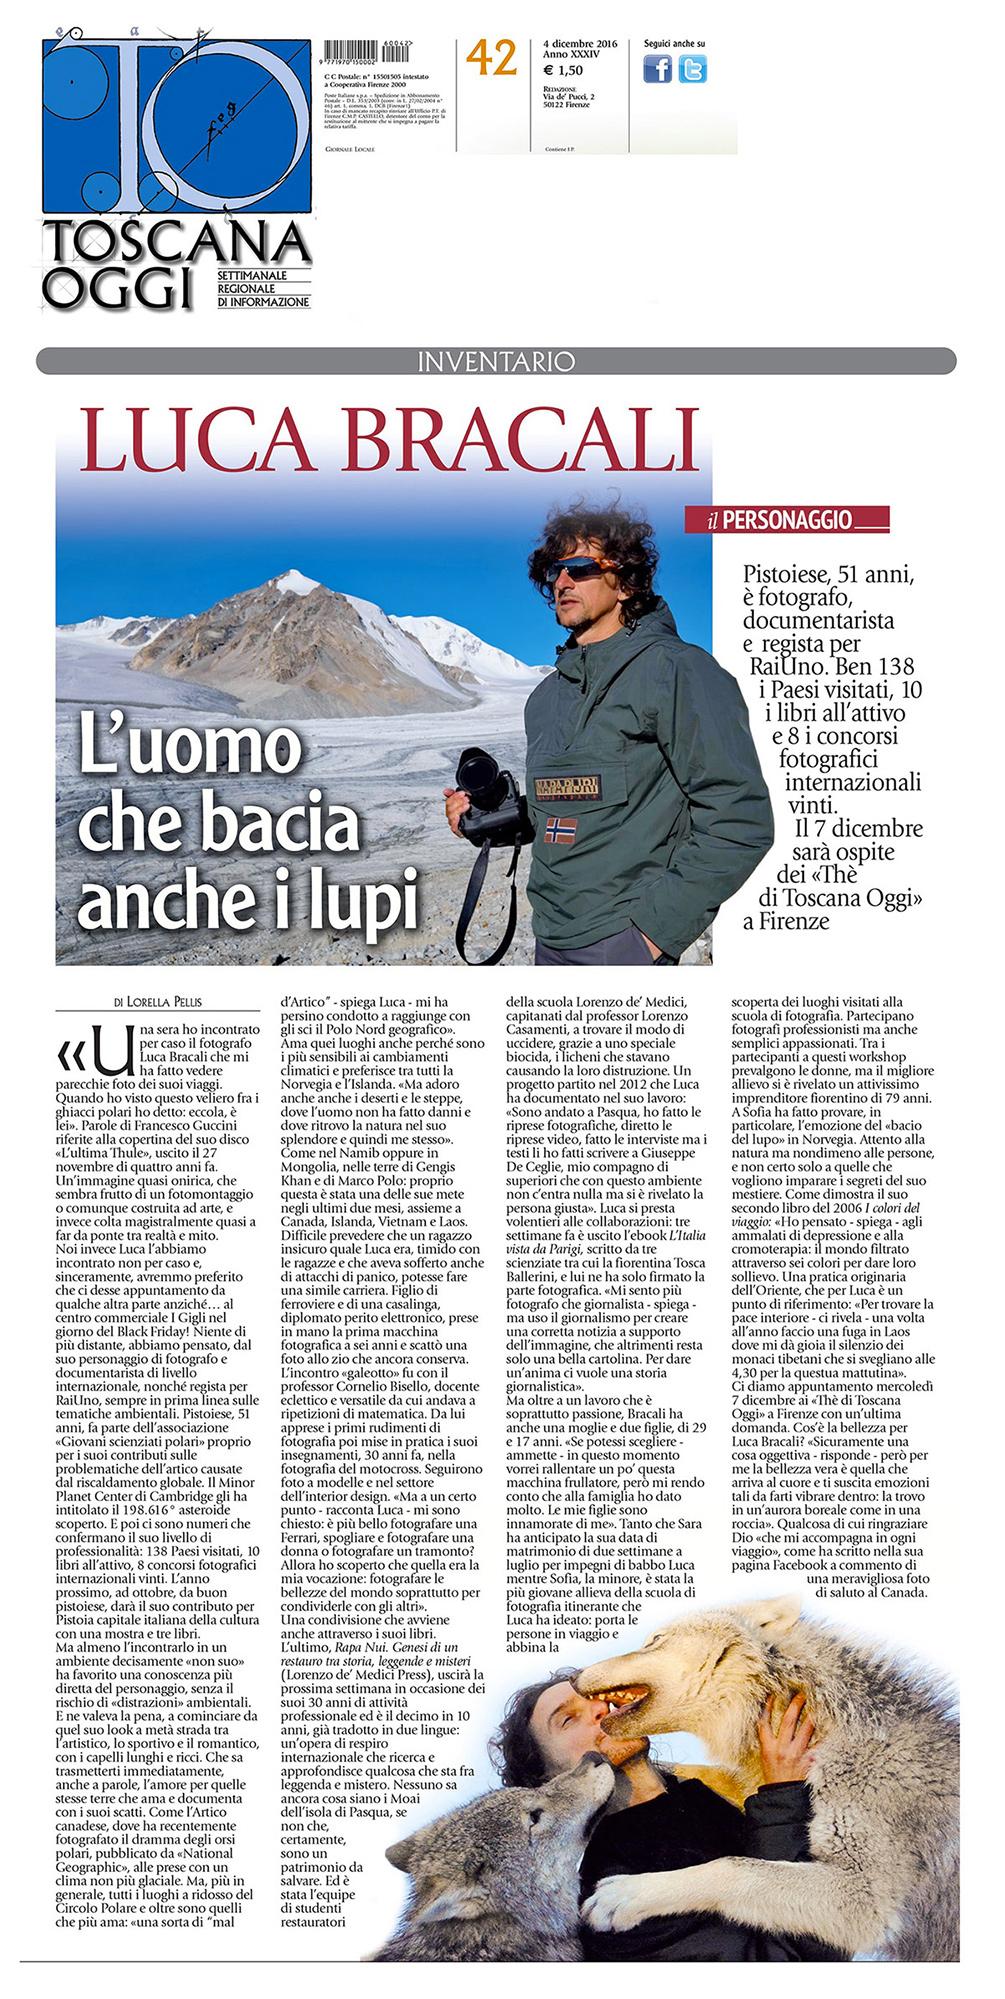 Toscana-Oggi_04.12.16-min